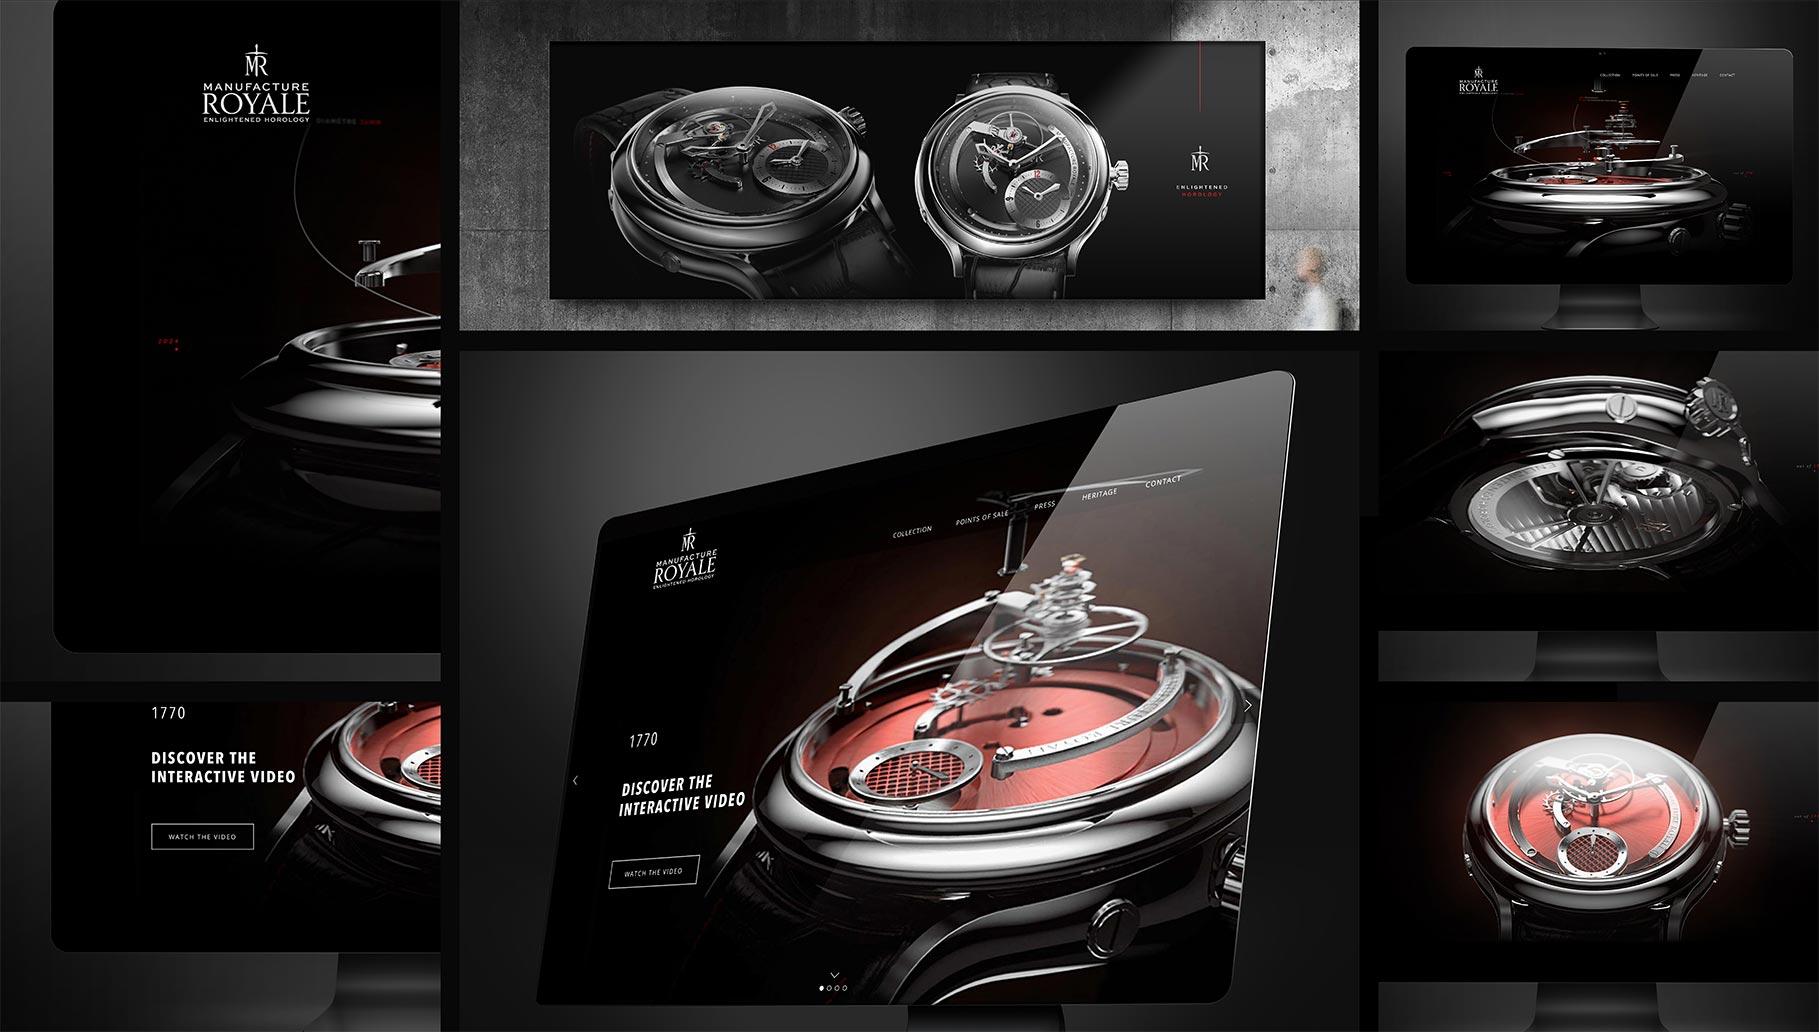 Manufacture_Royale_Agence_Communication_Marketing_BENBEN